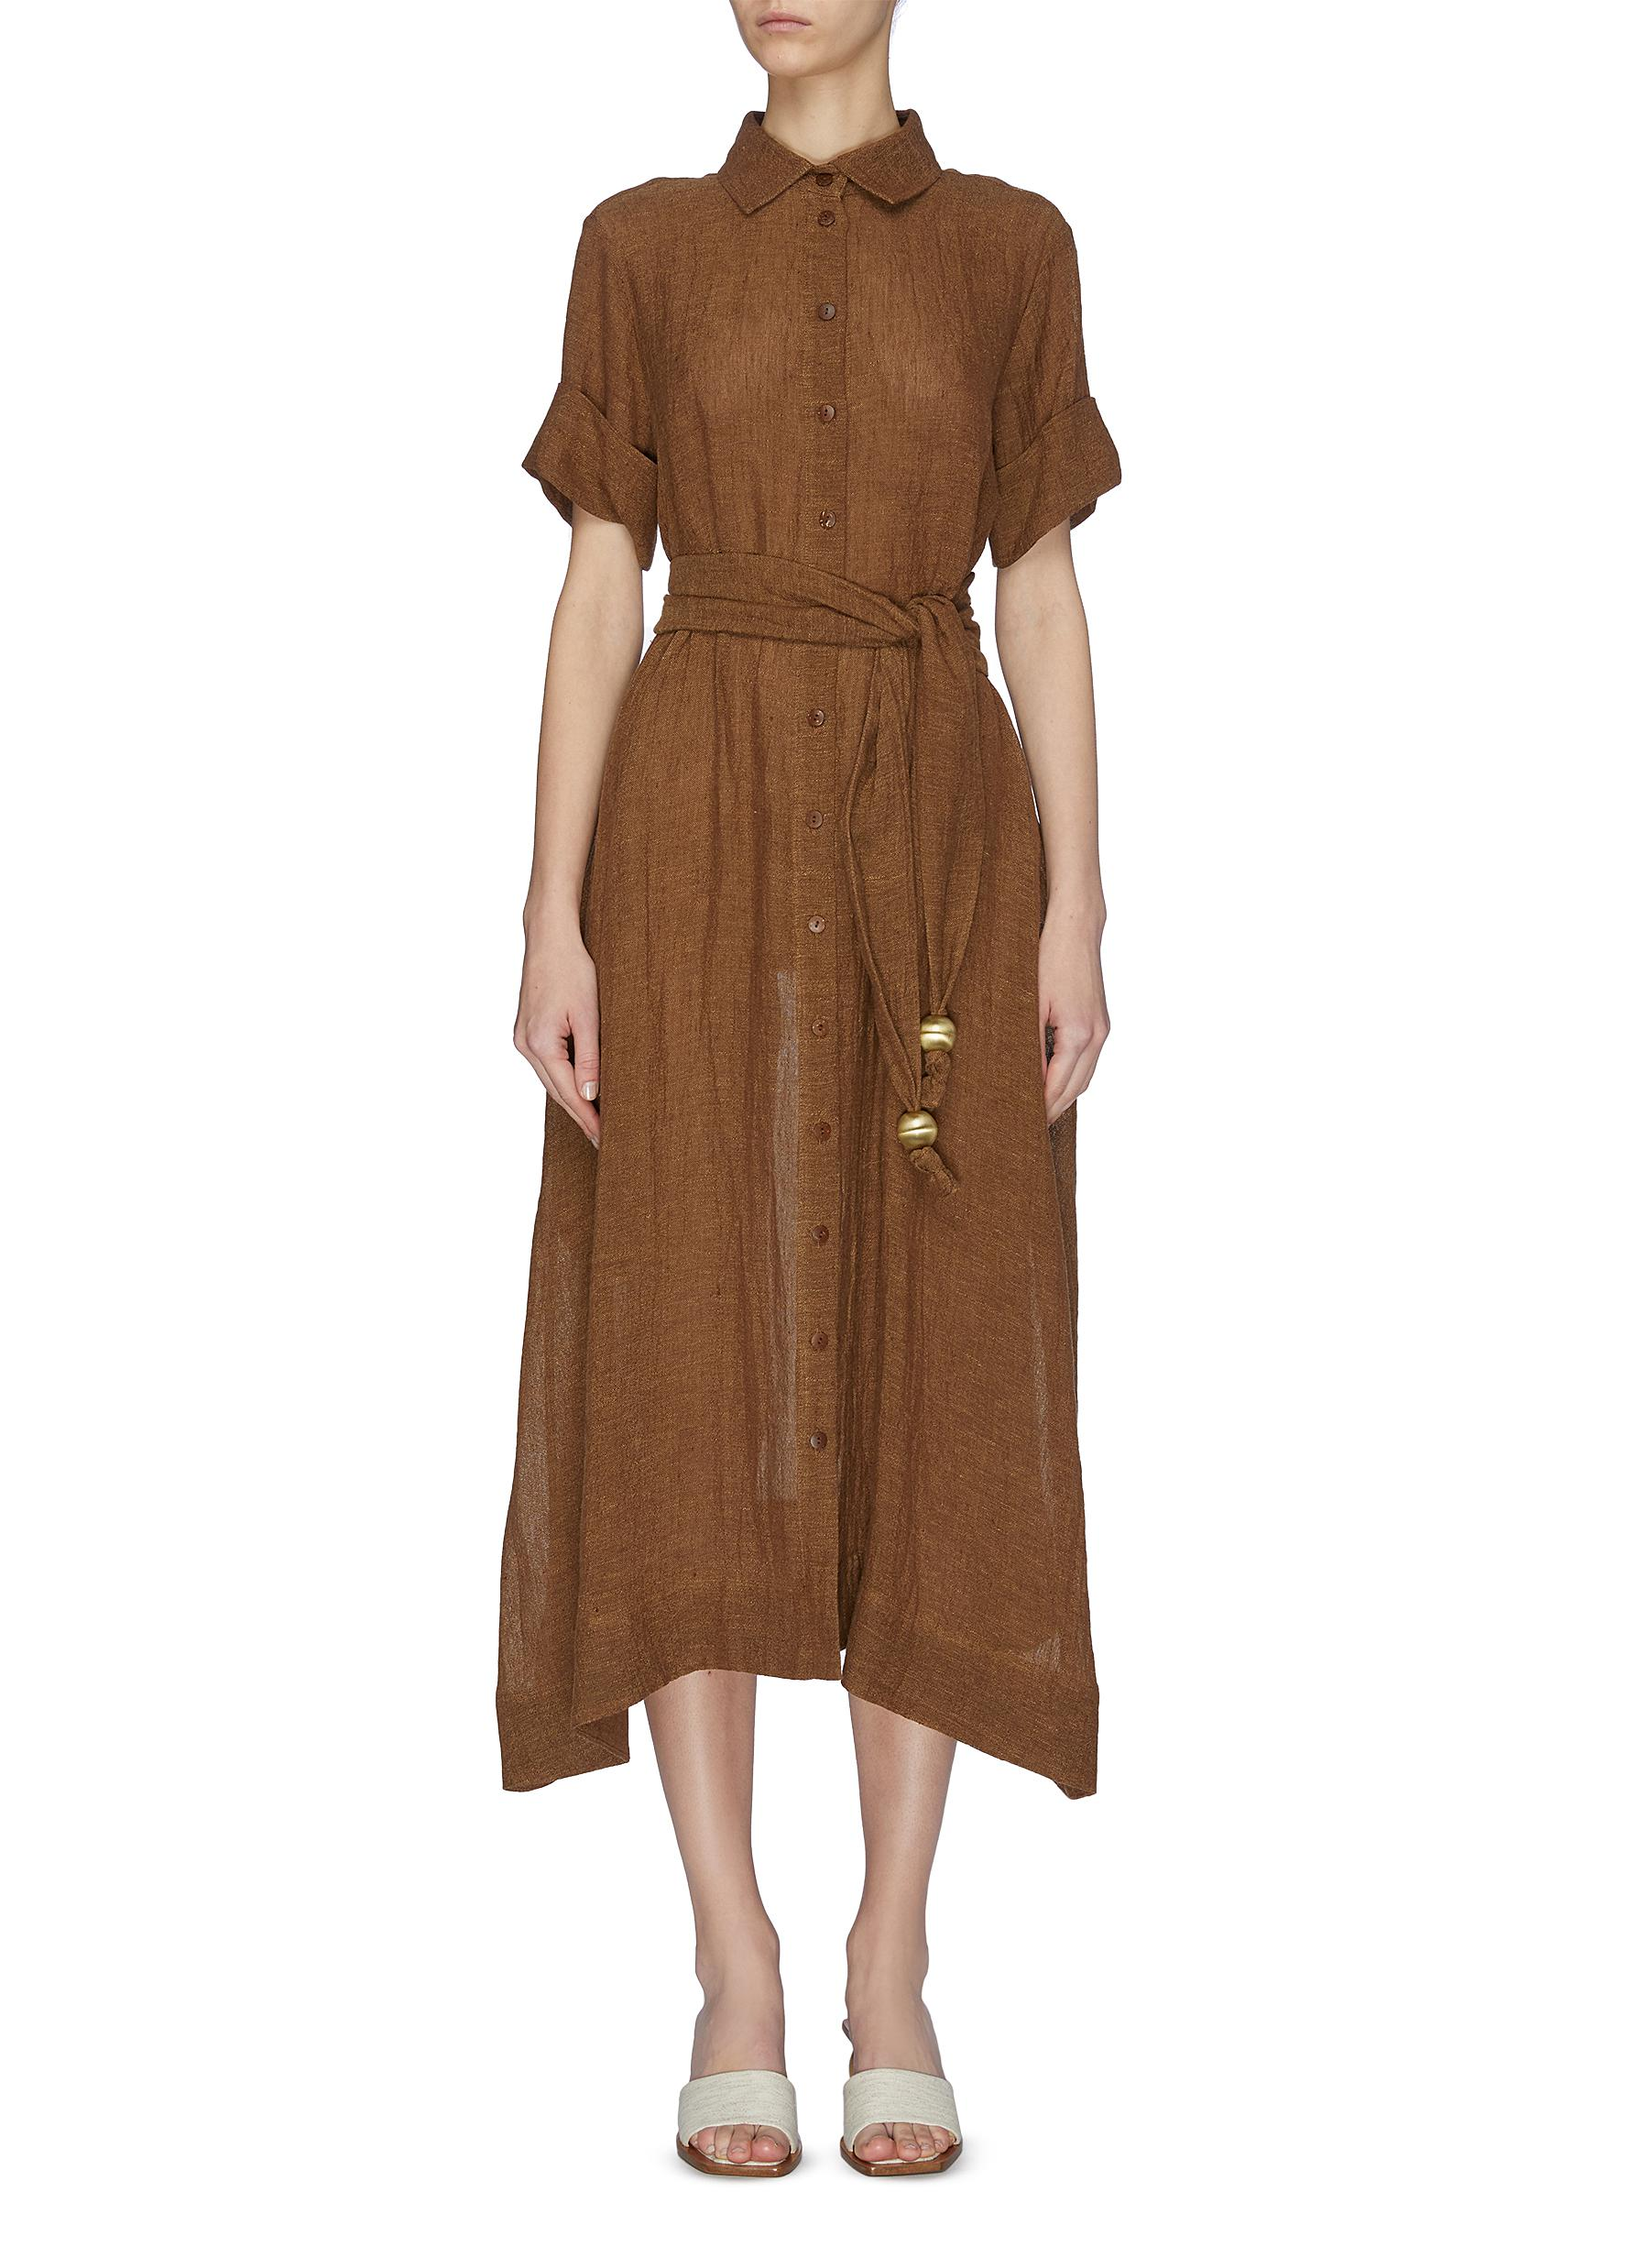 Buy Lisa Marie Fernandez Swimwear Sheer belted shirt dress